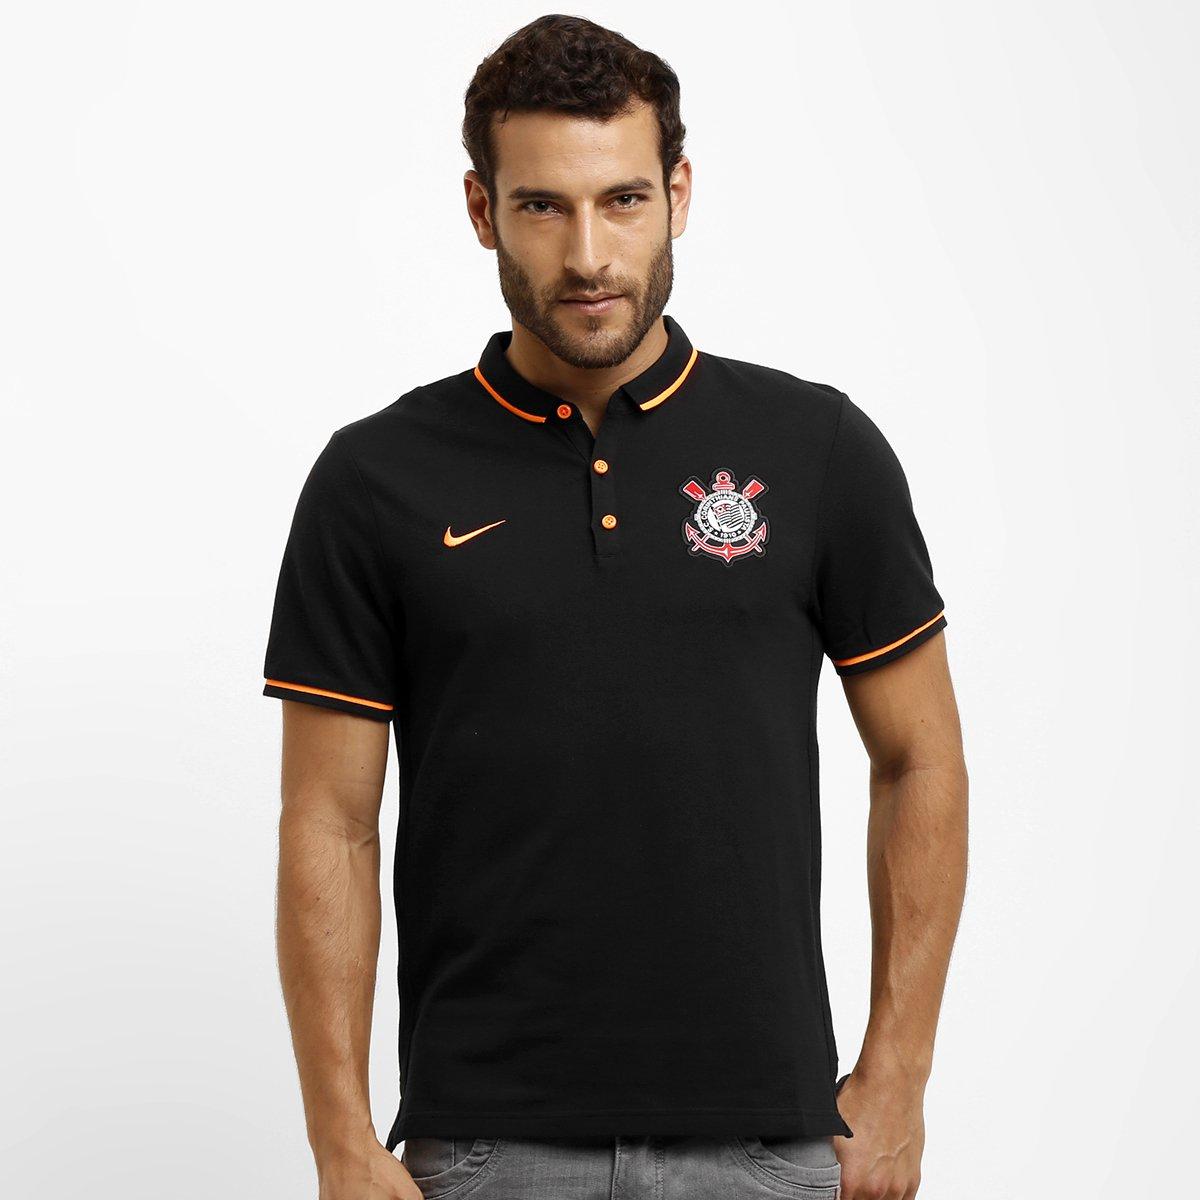 Camisa Polo Nike Corinthians League Auth - Compre Agora  497b4a4df7c89